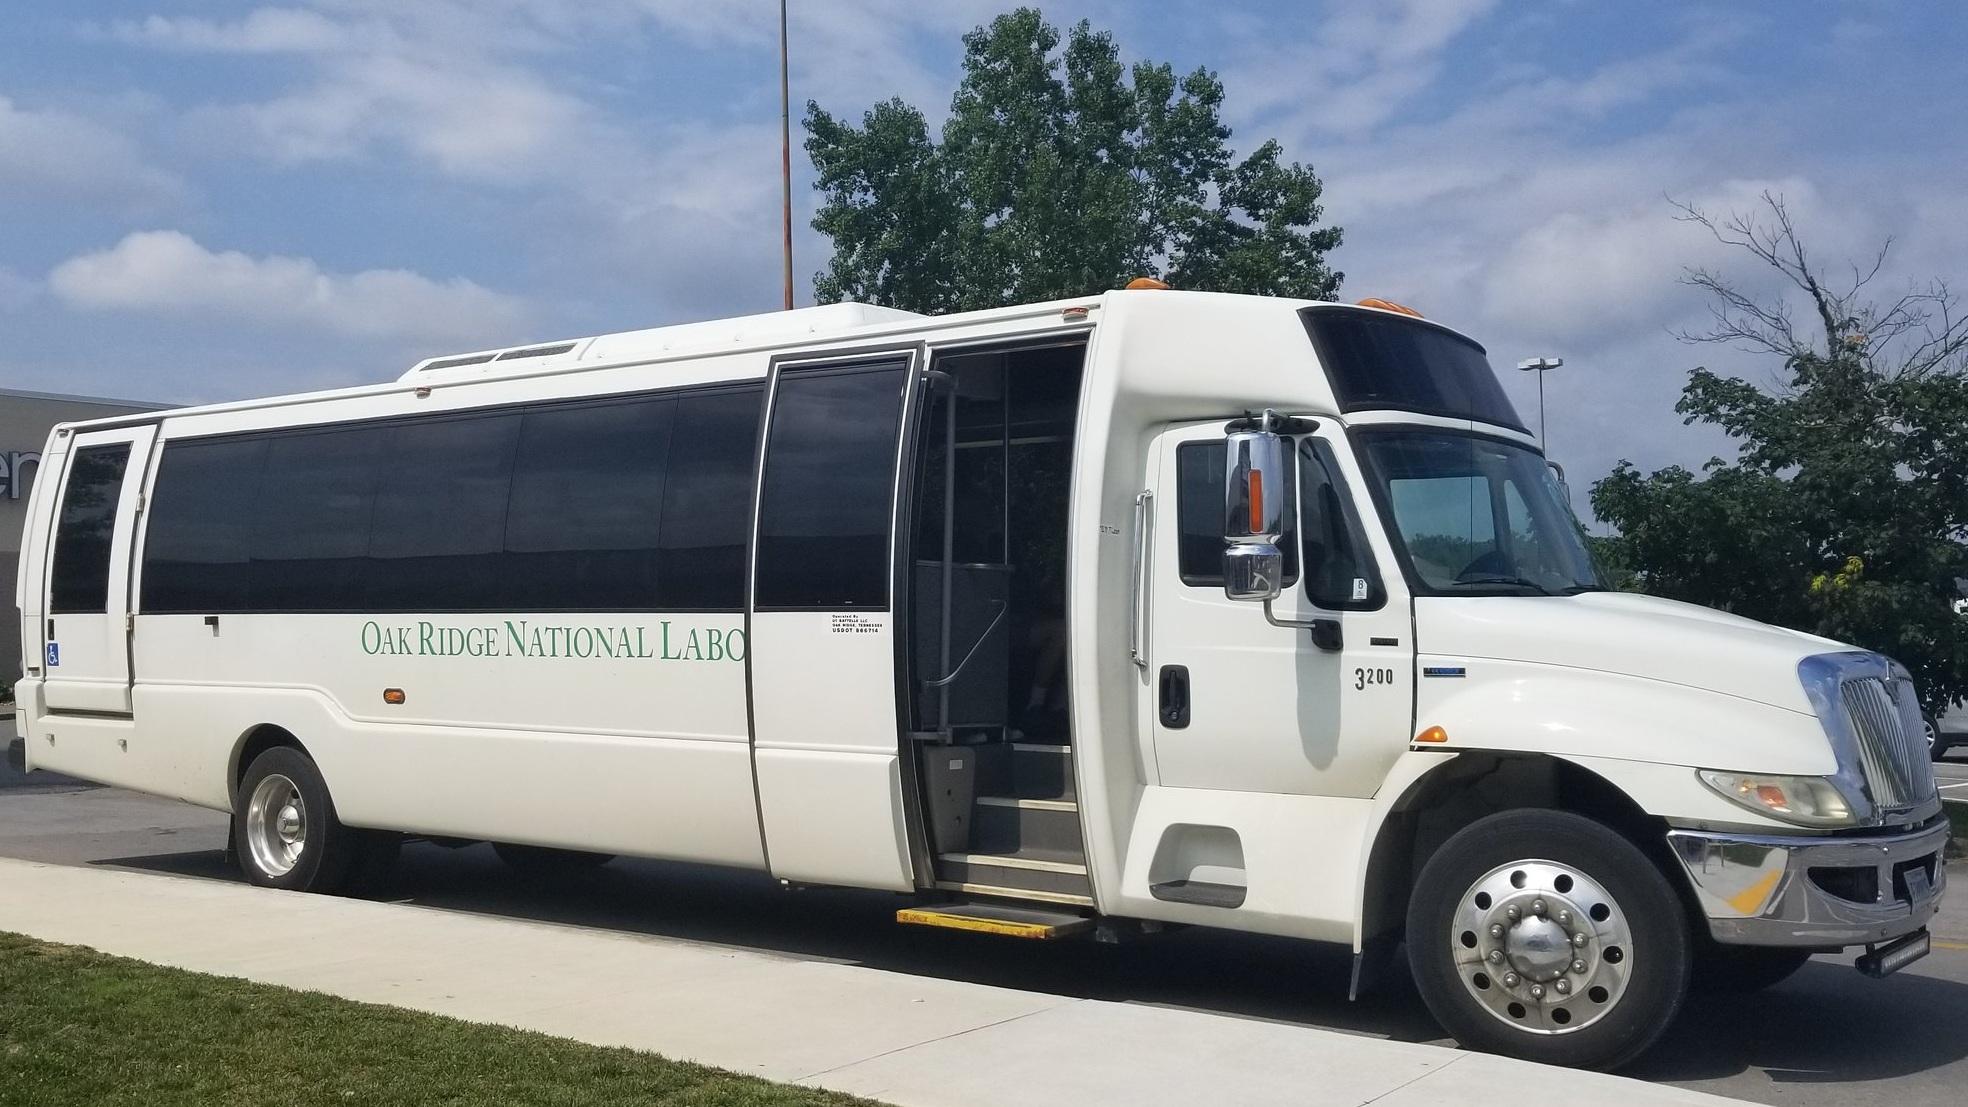 Oak Ridge National Laboratory Tour Bus